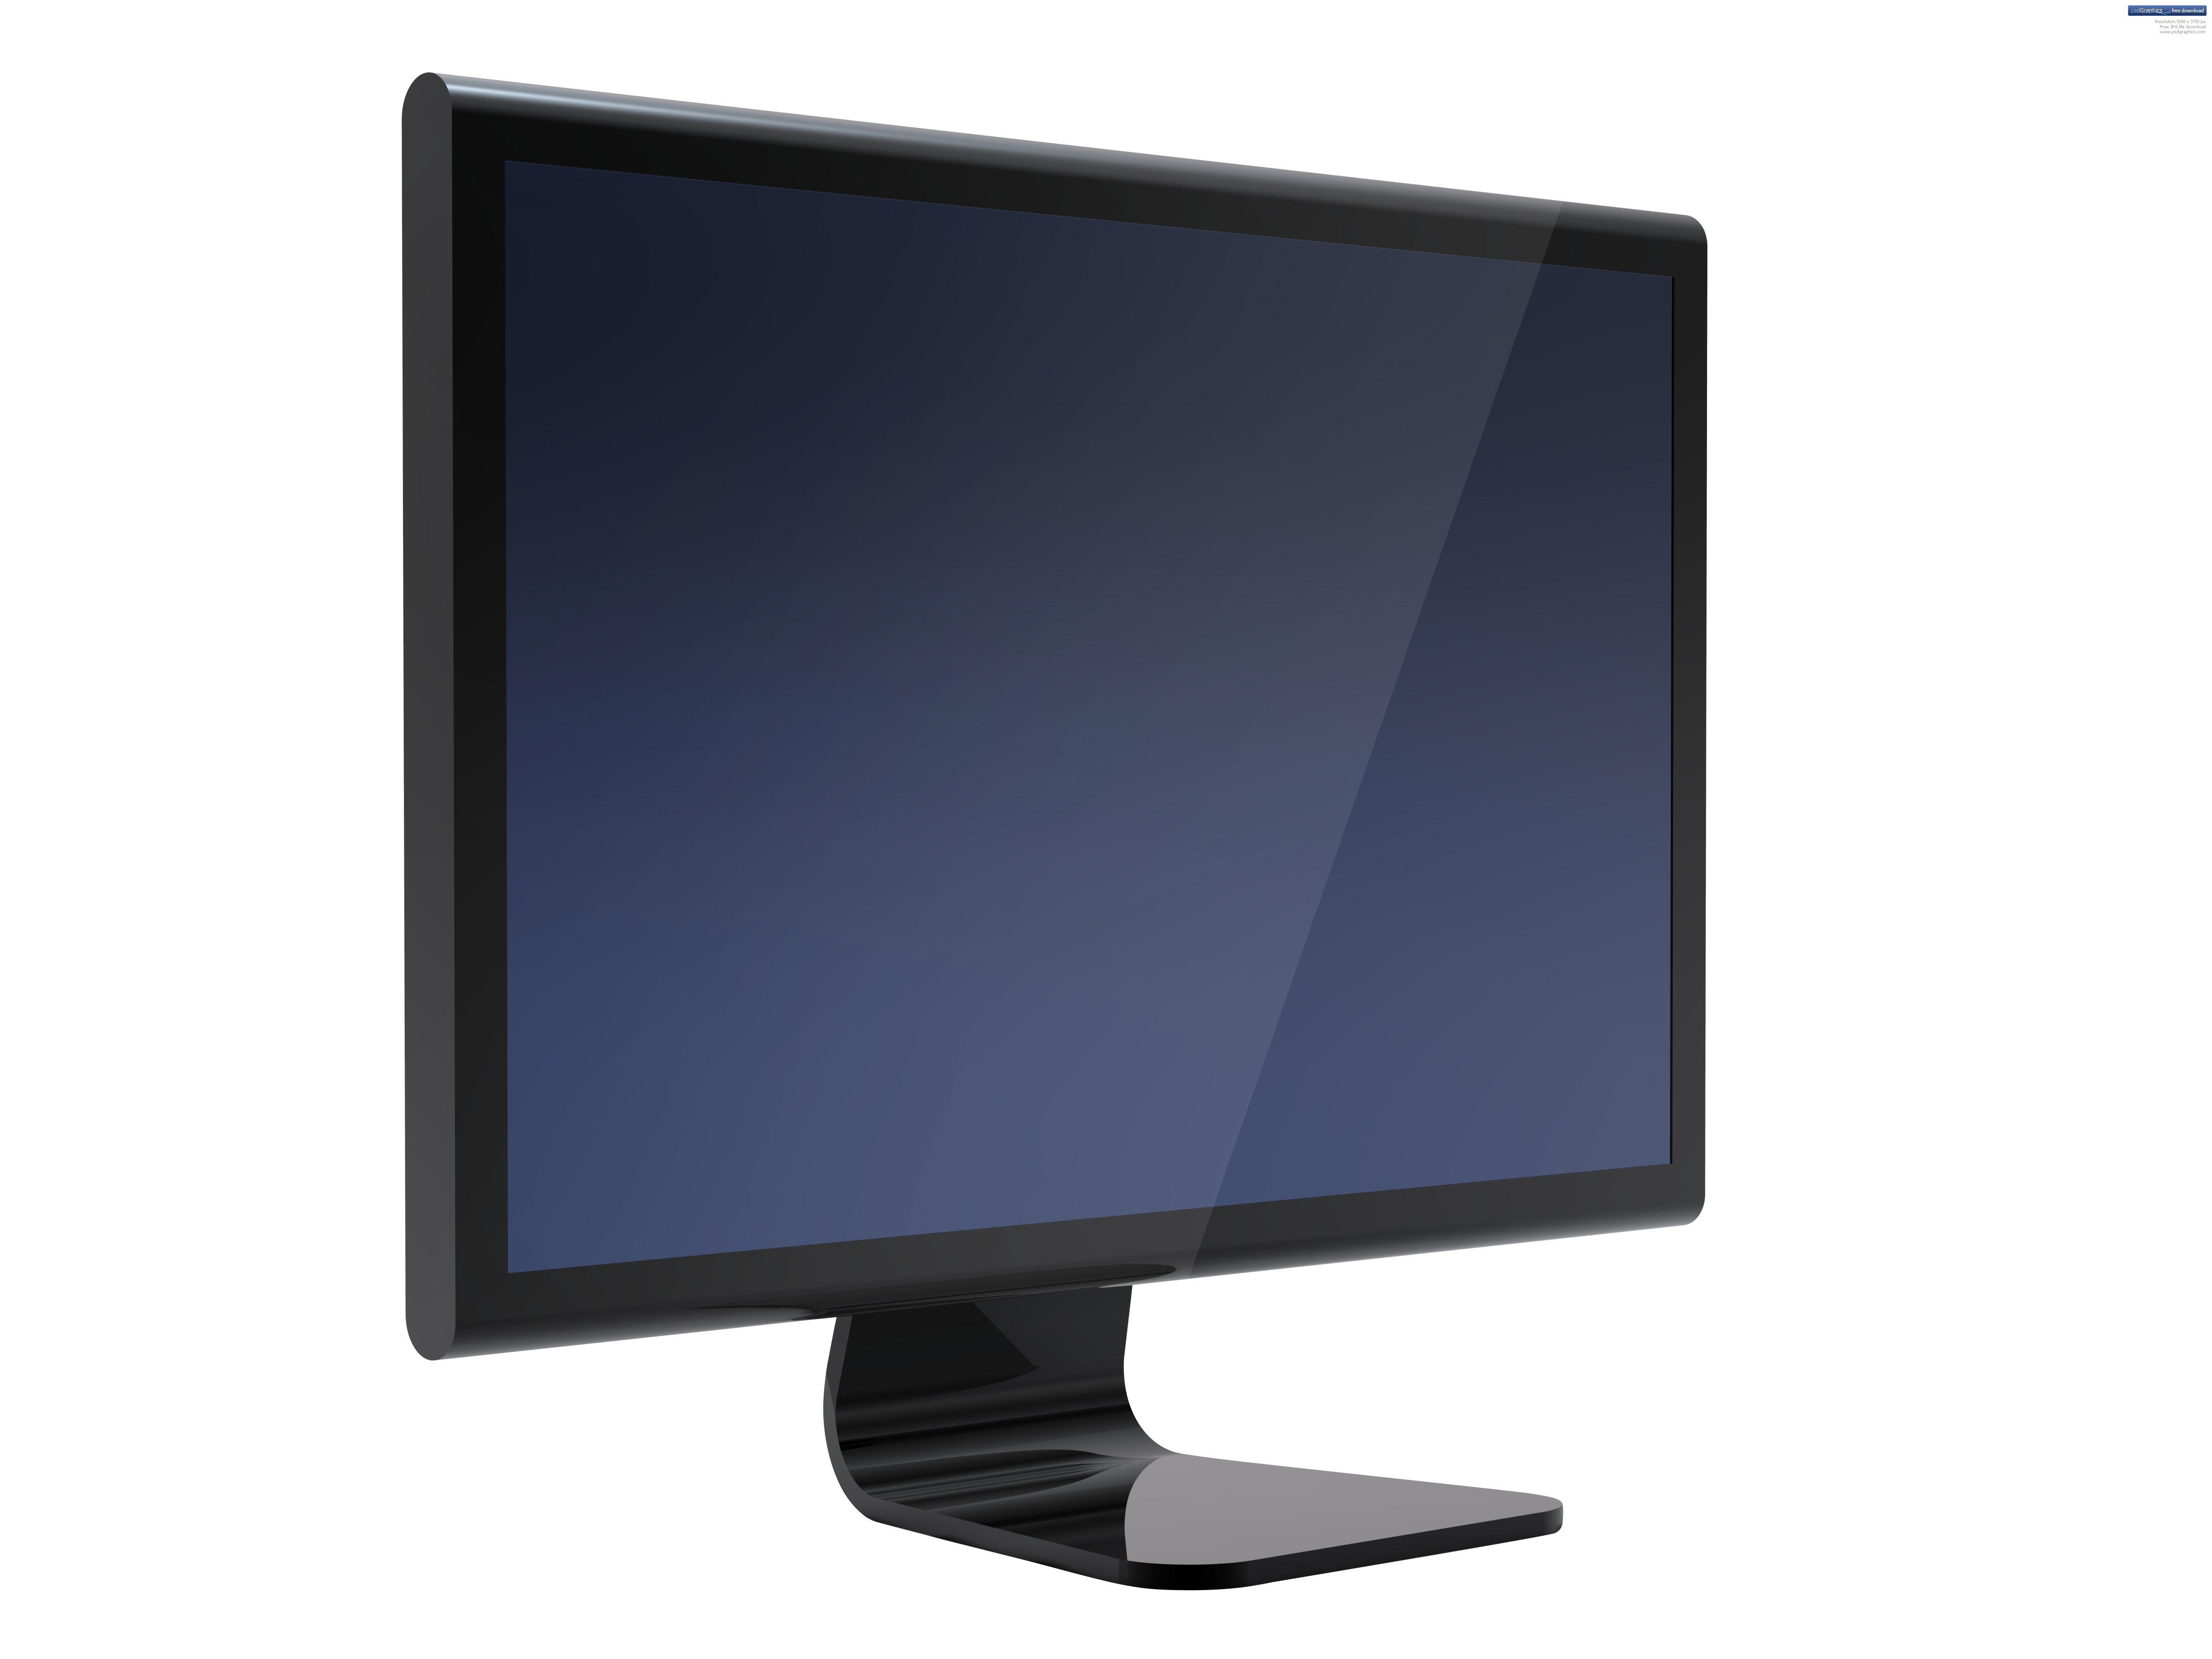 Black LCD display PSDGraphics 5000x3750